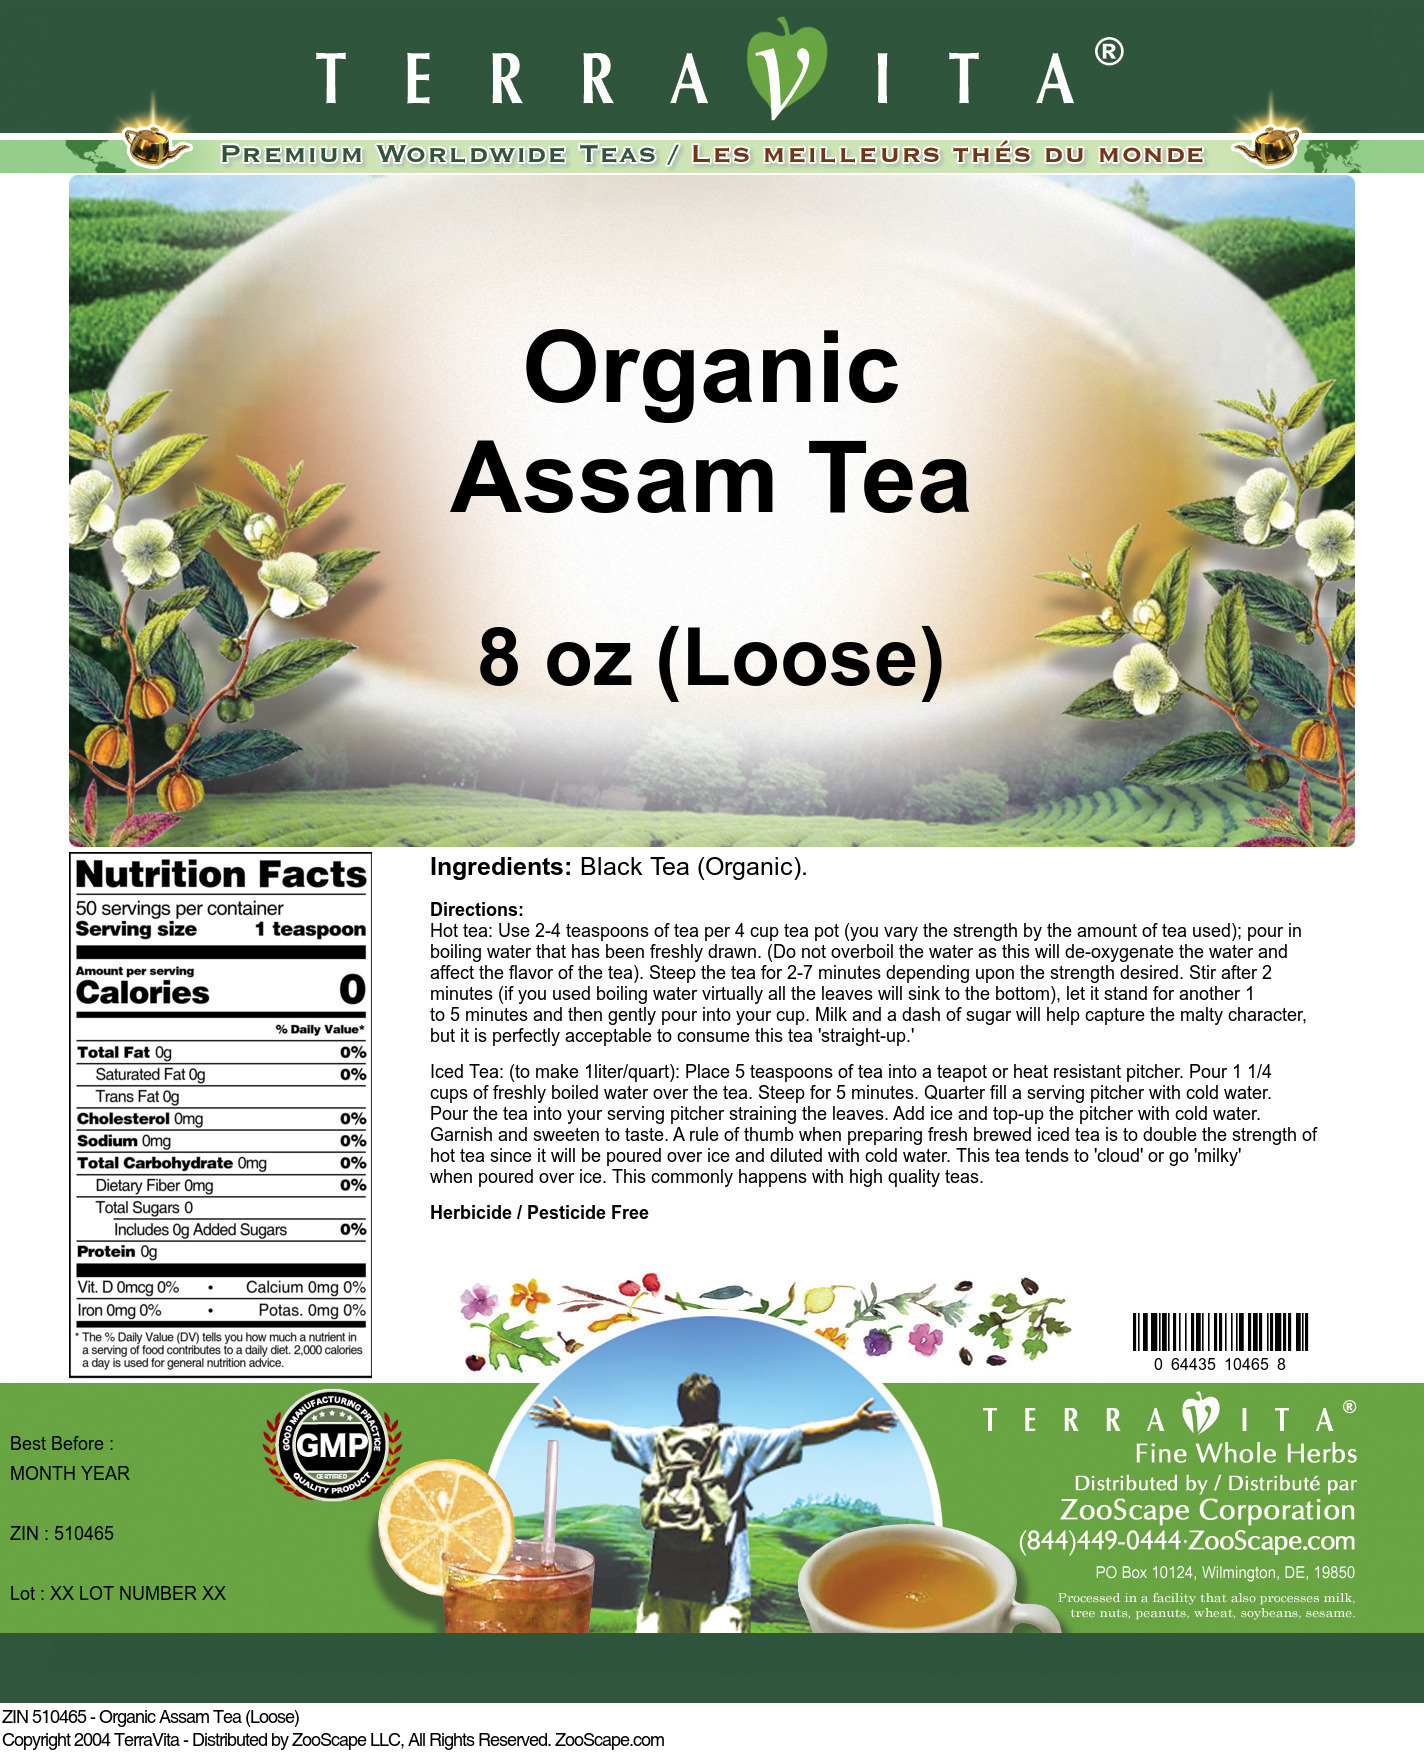 Organic Assam Tea (Loose)